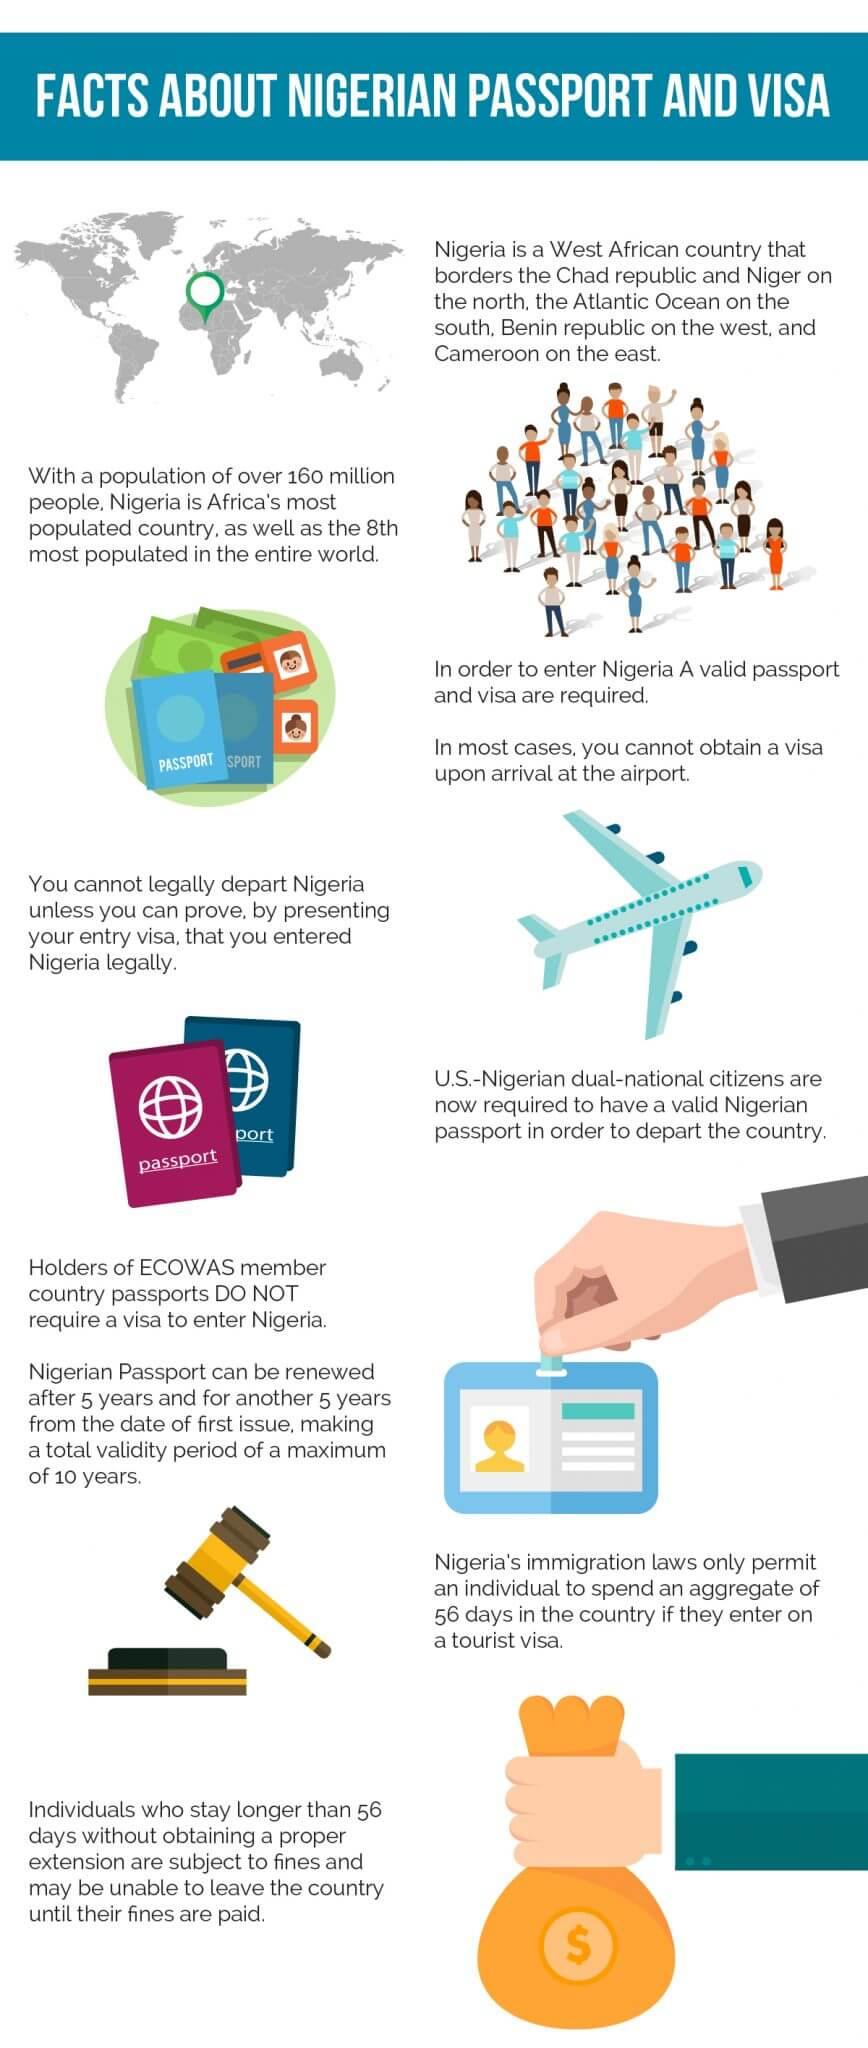 Nigerian Passport and Visa